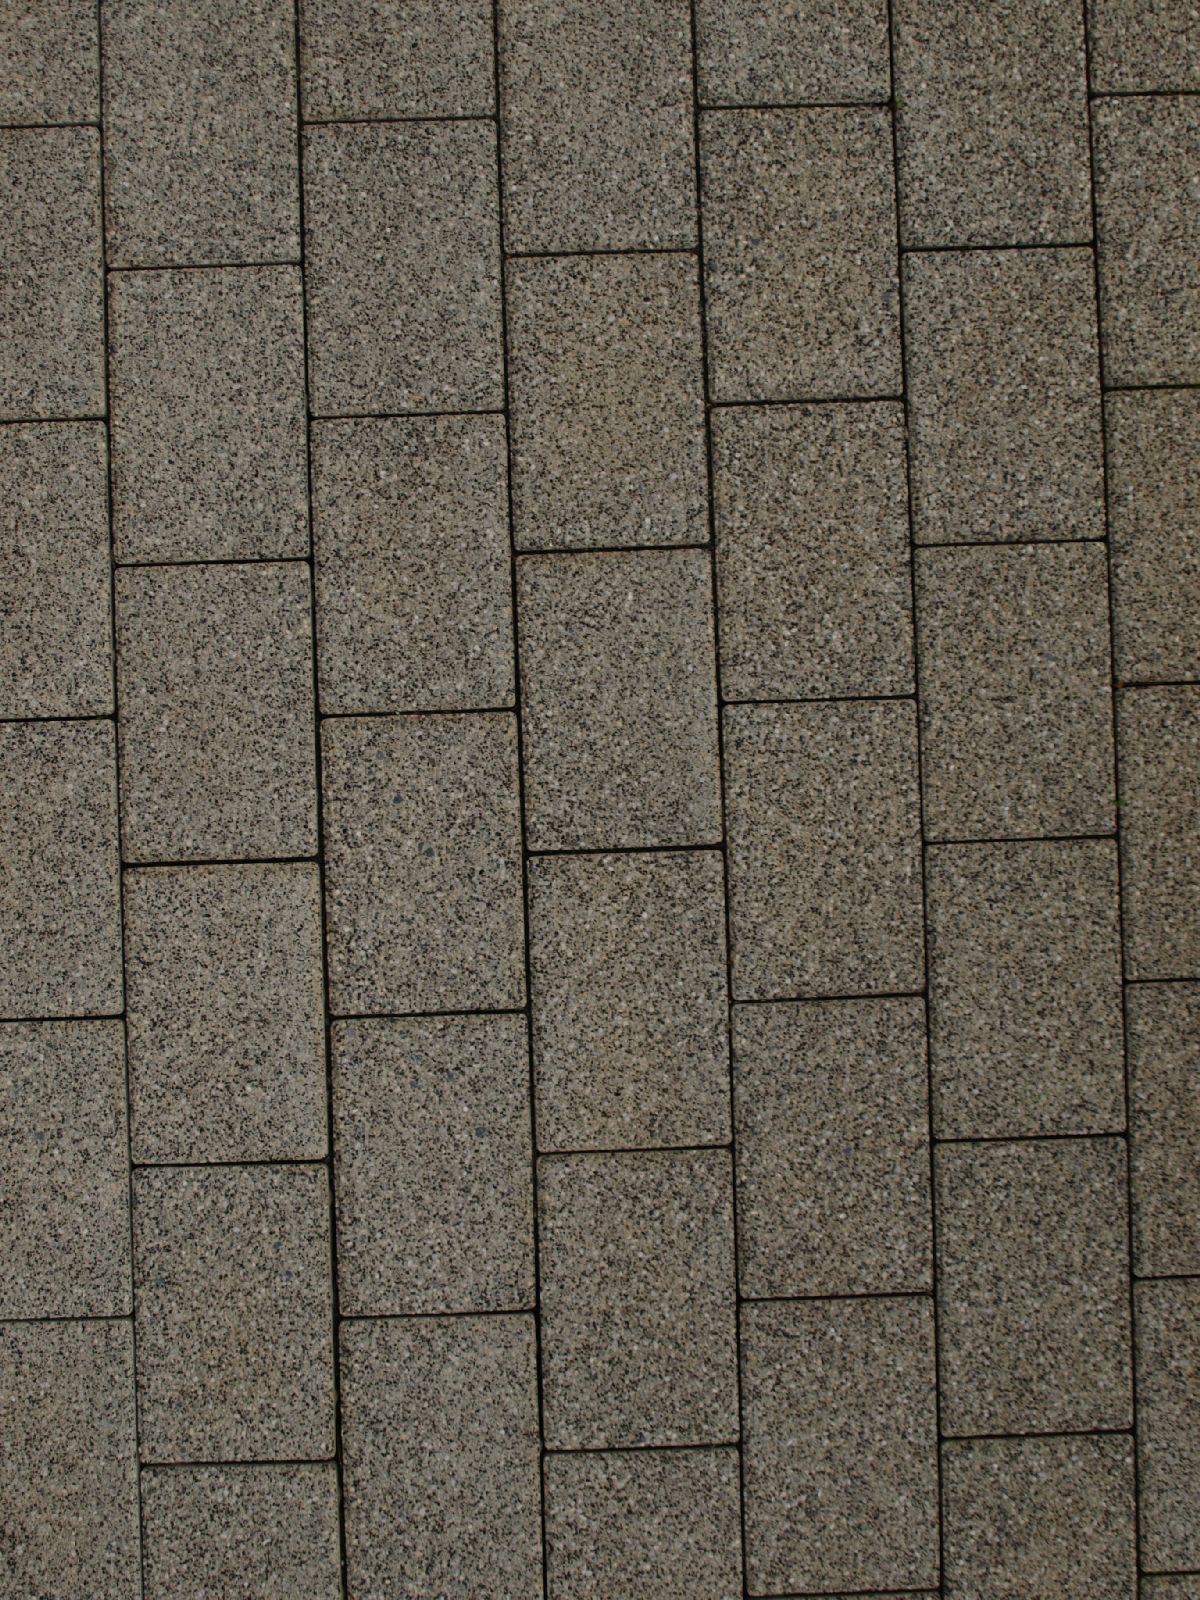 Ground-Urban_Texture_A_PC011371